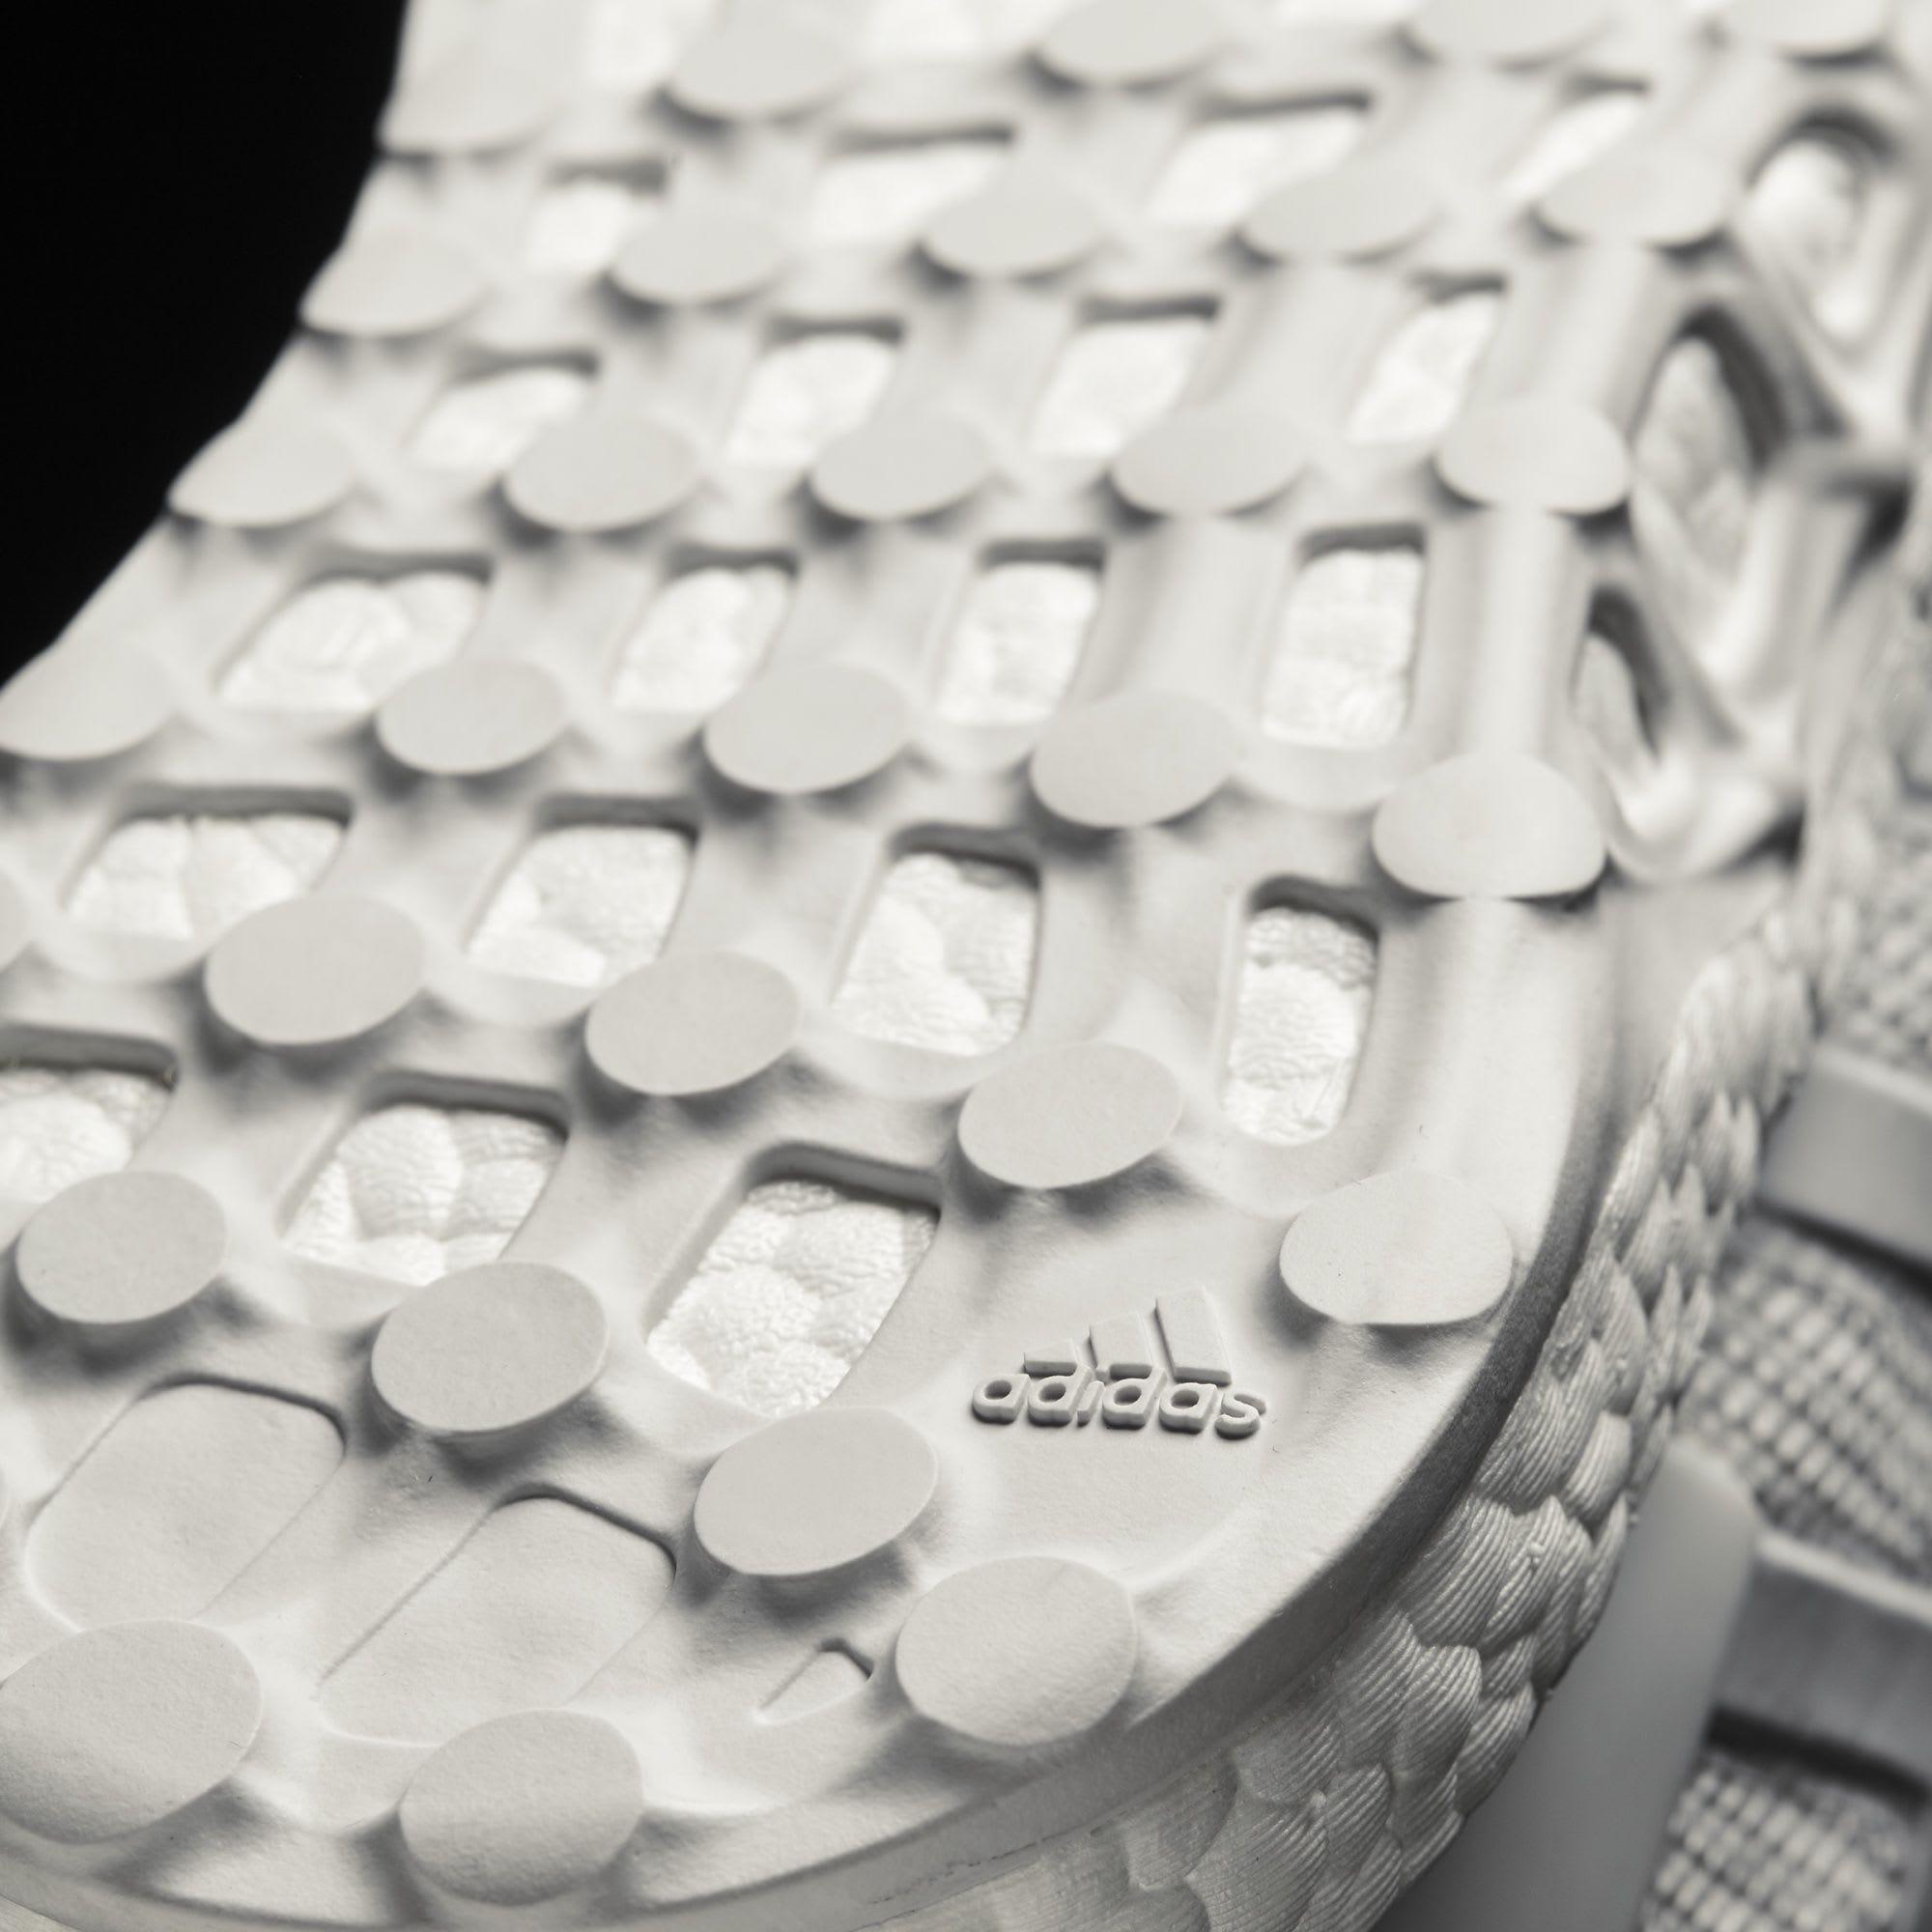 Adidas Y3 Pureboost White BY8955 Sole Detail